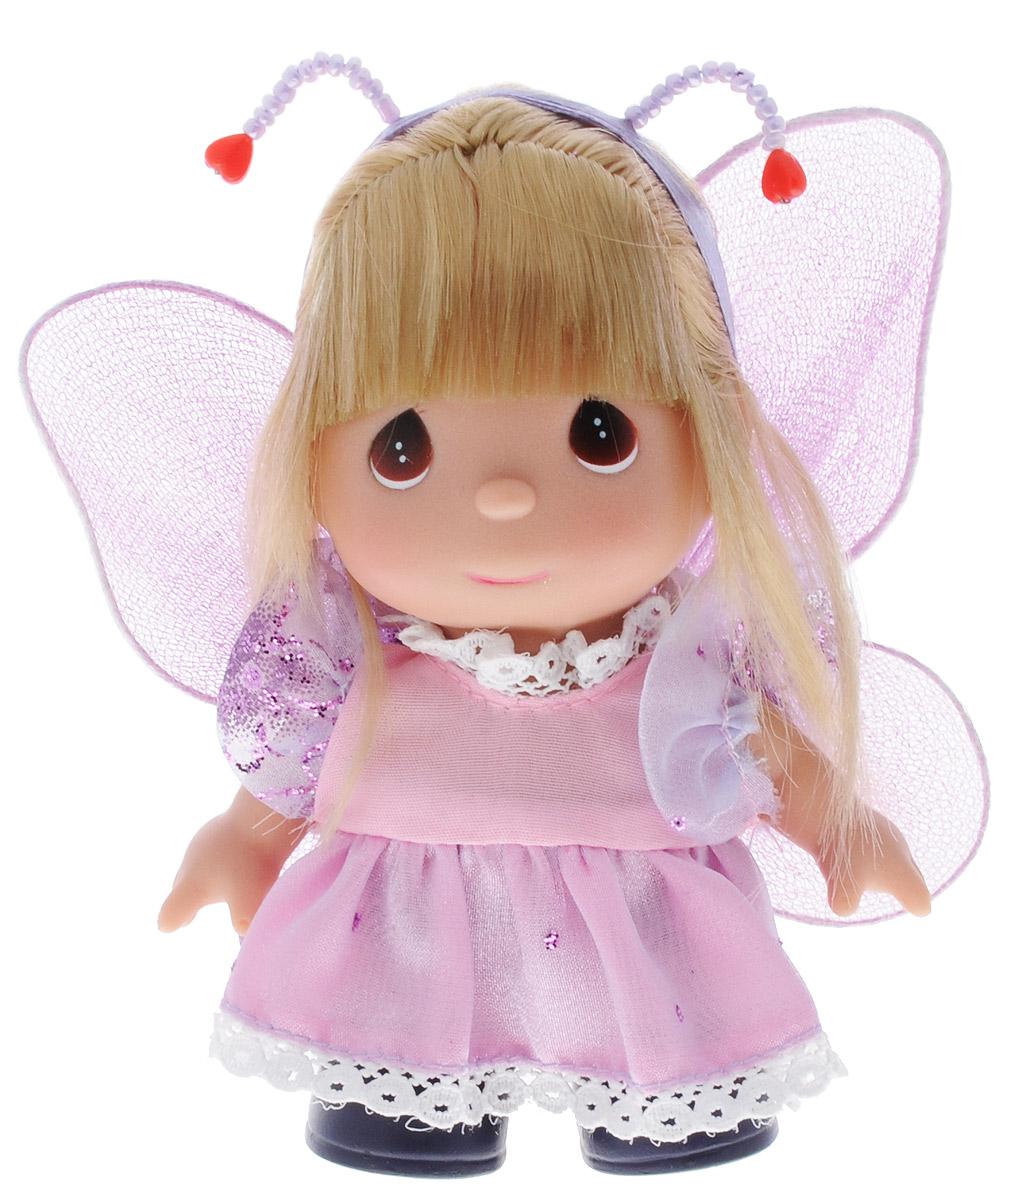 Precious Moments Мини-кукла Бабочка цвет наряда розовый сиреневый precious moments мини кукла бабочка цвет наряда розовый сиреневый